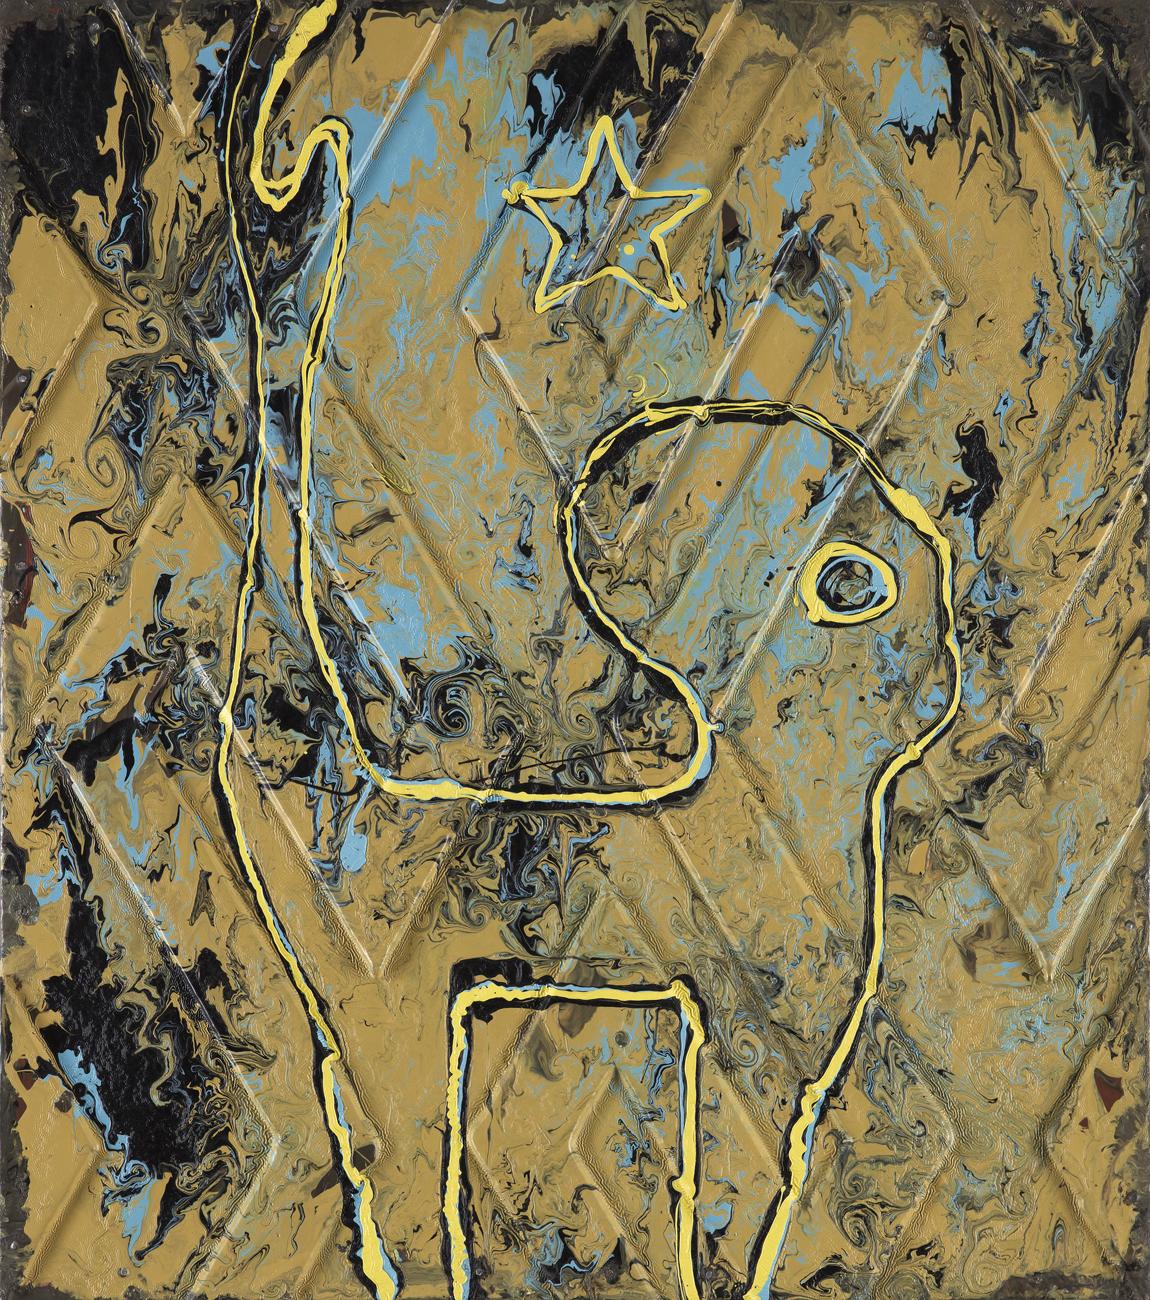 Anders A  Separat - ute i skogen  1987 Paint on panel 70 x 61,5 cm